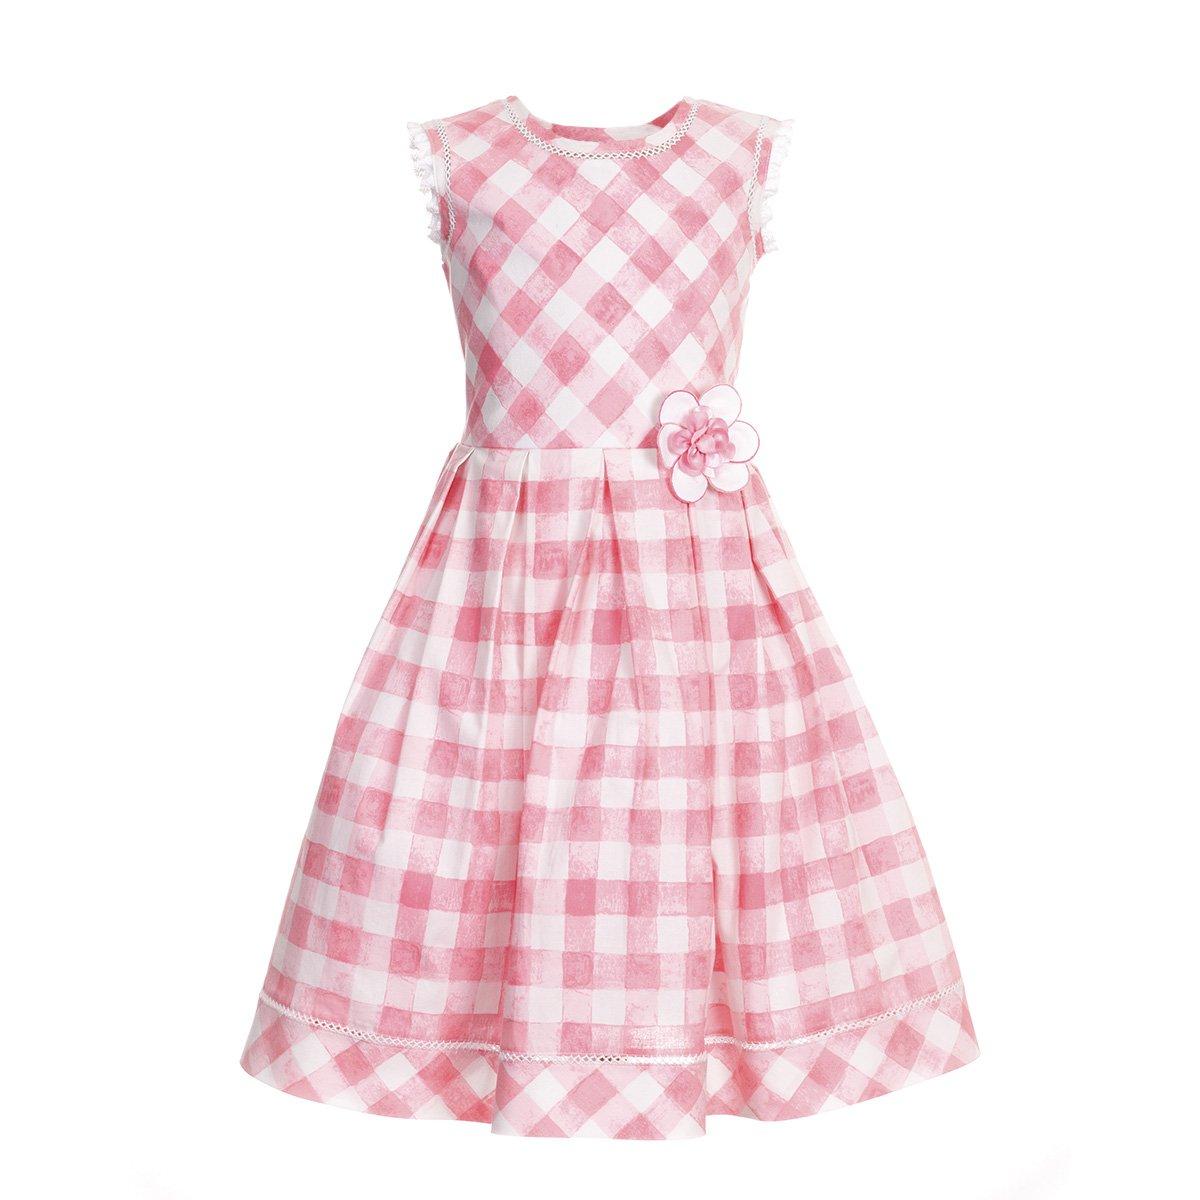 Asombroso Vestidos De Fiesta Sears Colección - Colección de Vestidos ...